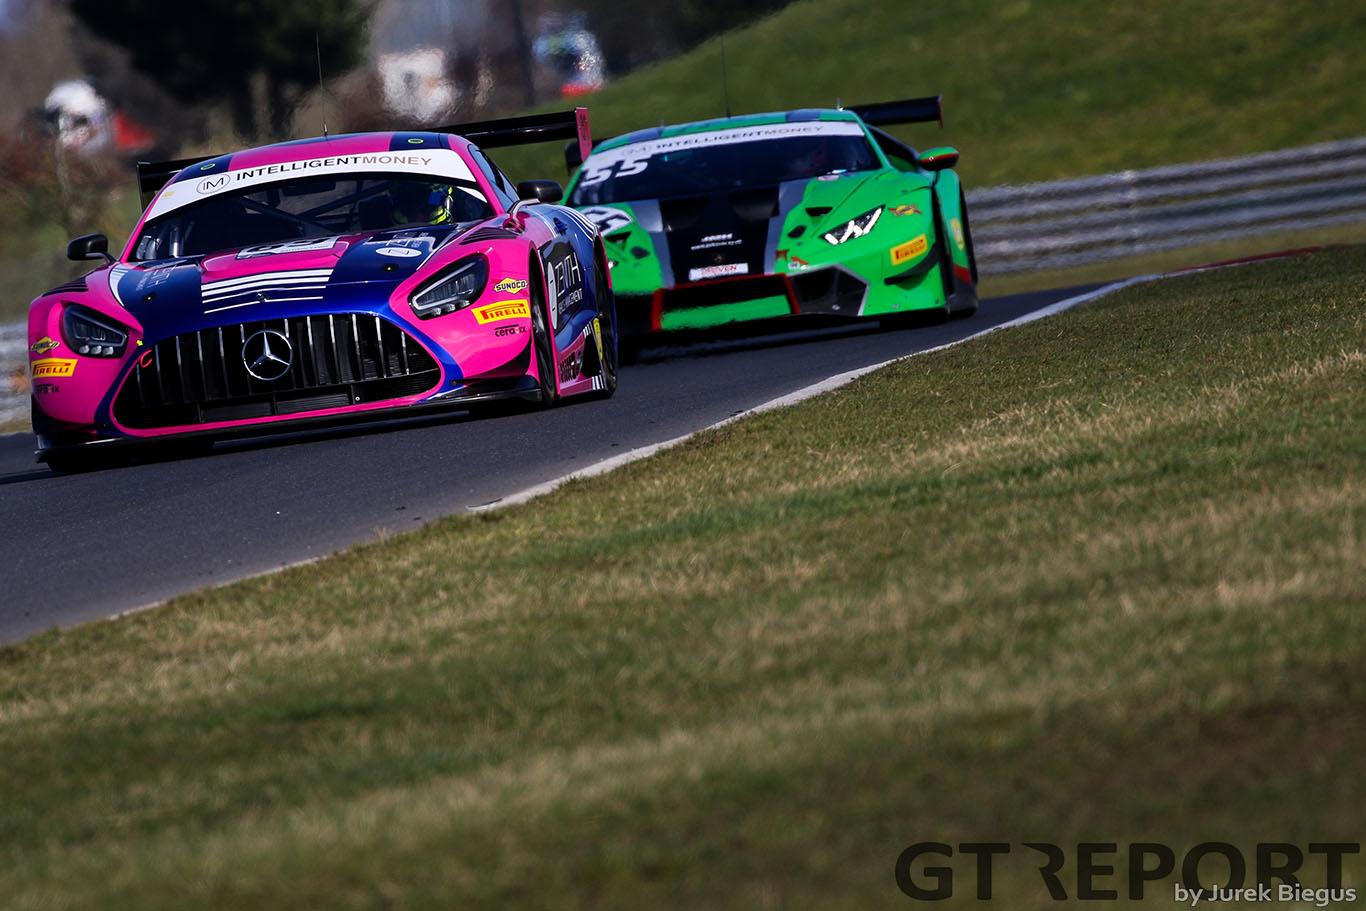 British GT set to roar back into life at Oulton Park